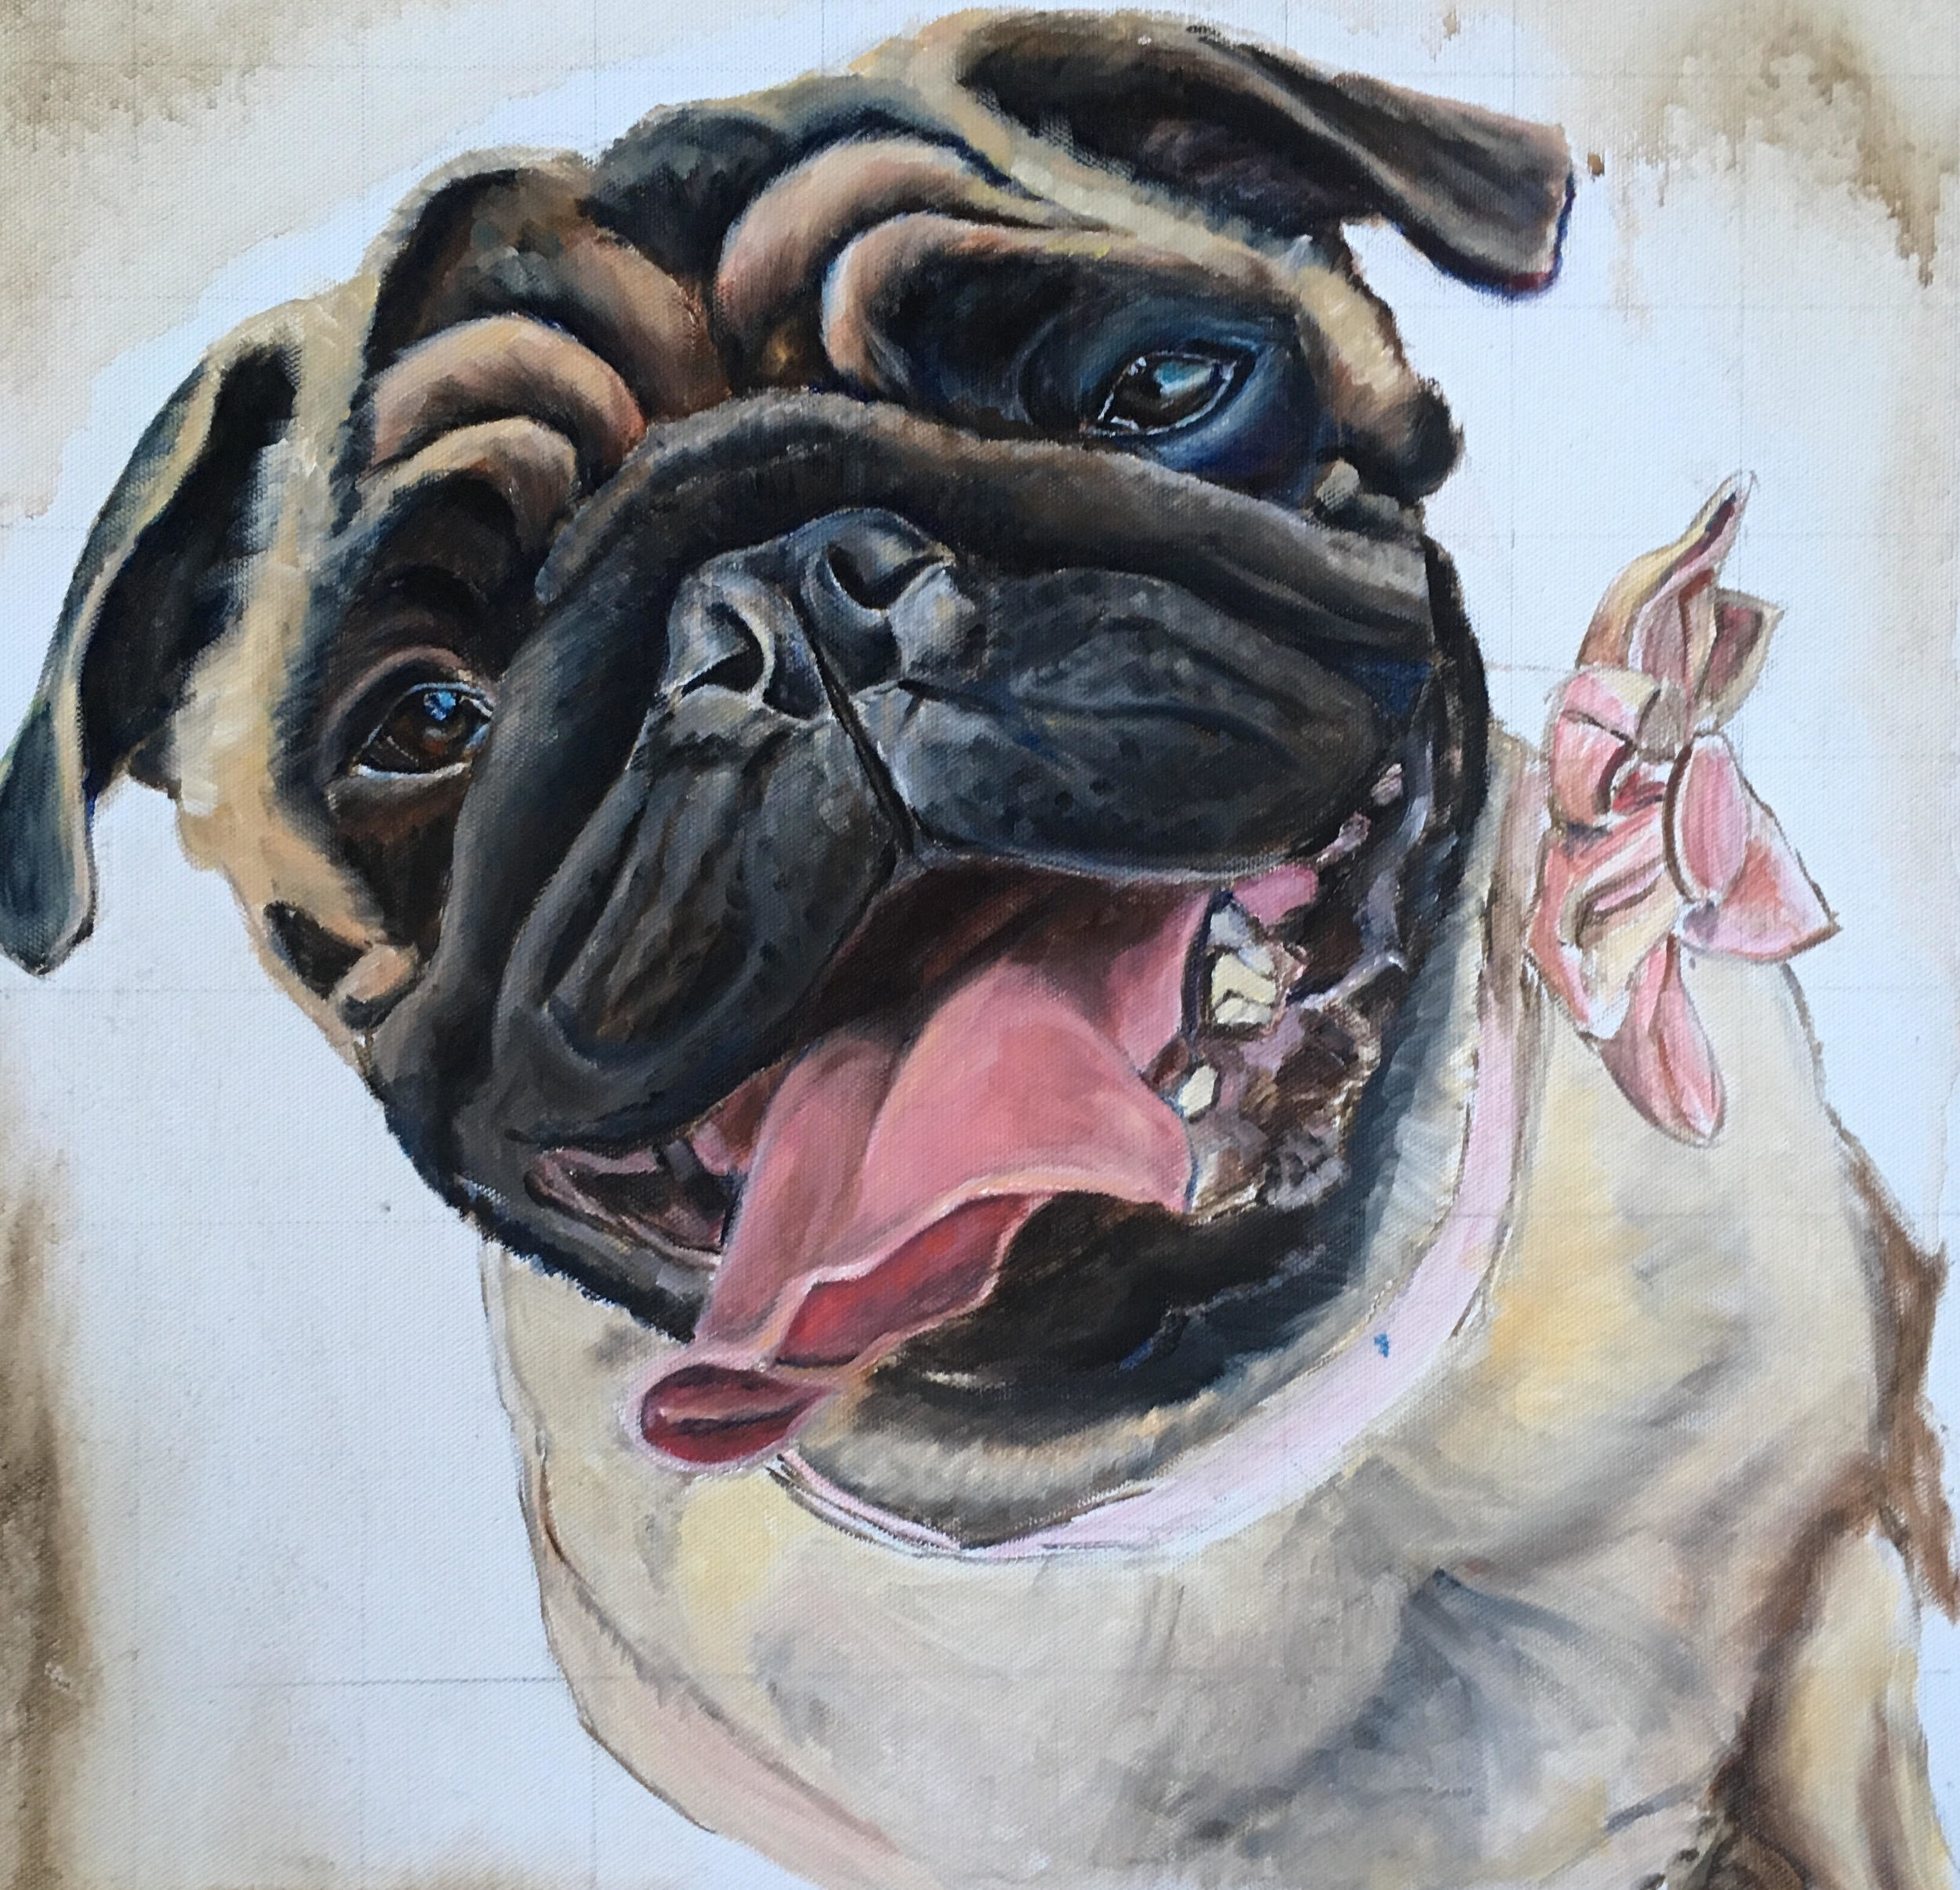 PUG DOG UNDER PAINTING 2. CUSTOM PORTRAIT BY OPAL PASTRO ART